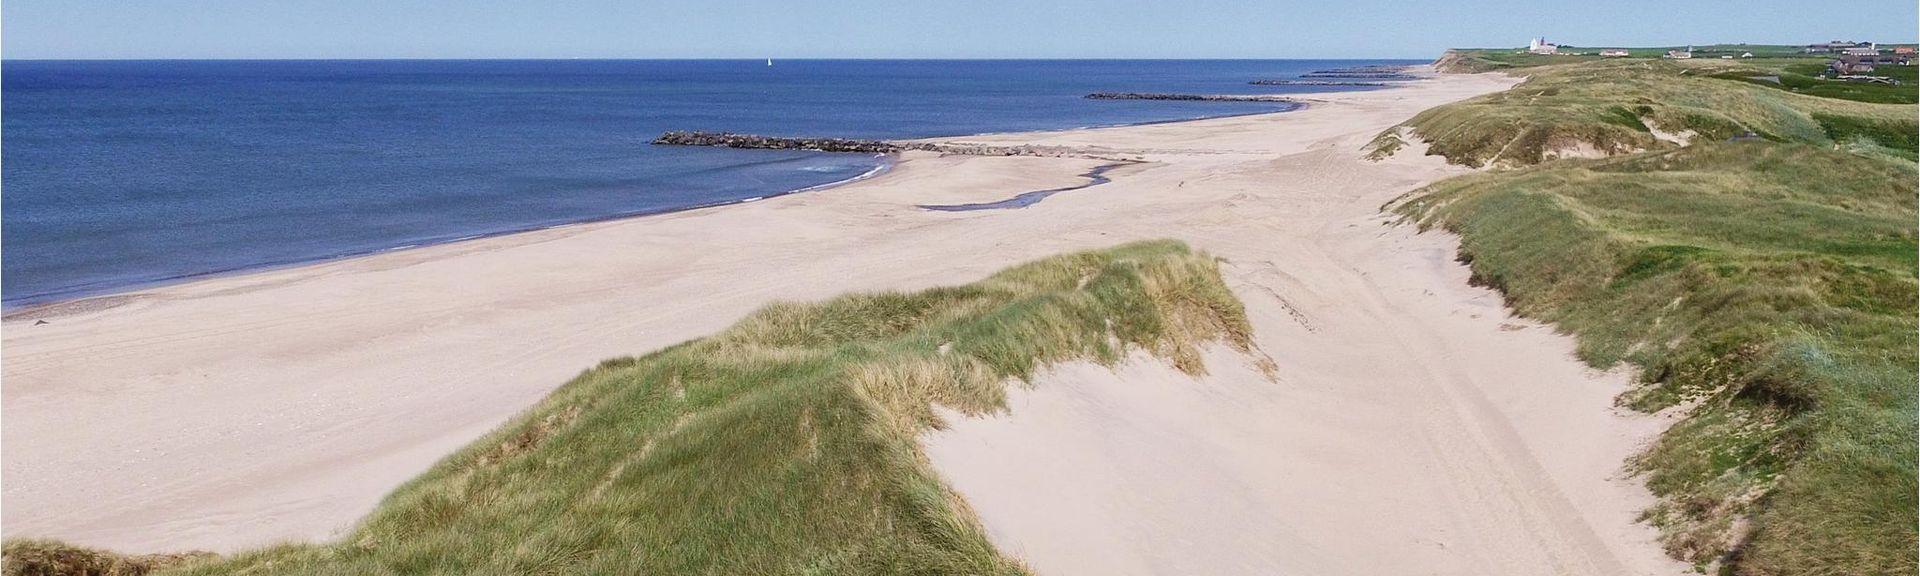 Thorsminde, Vemb, Midtjylland, Denmark